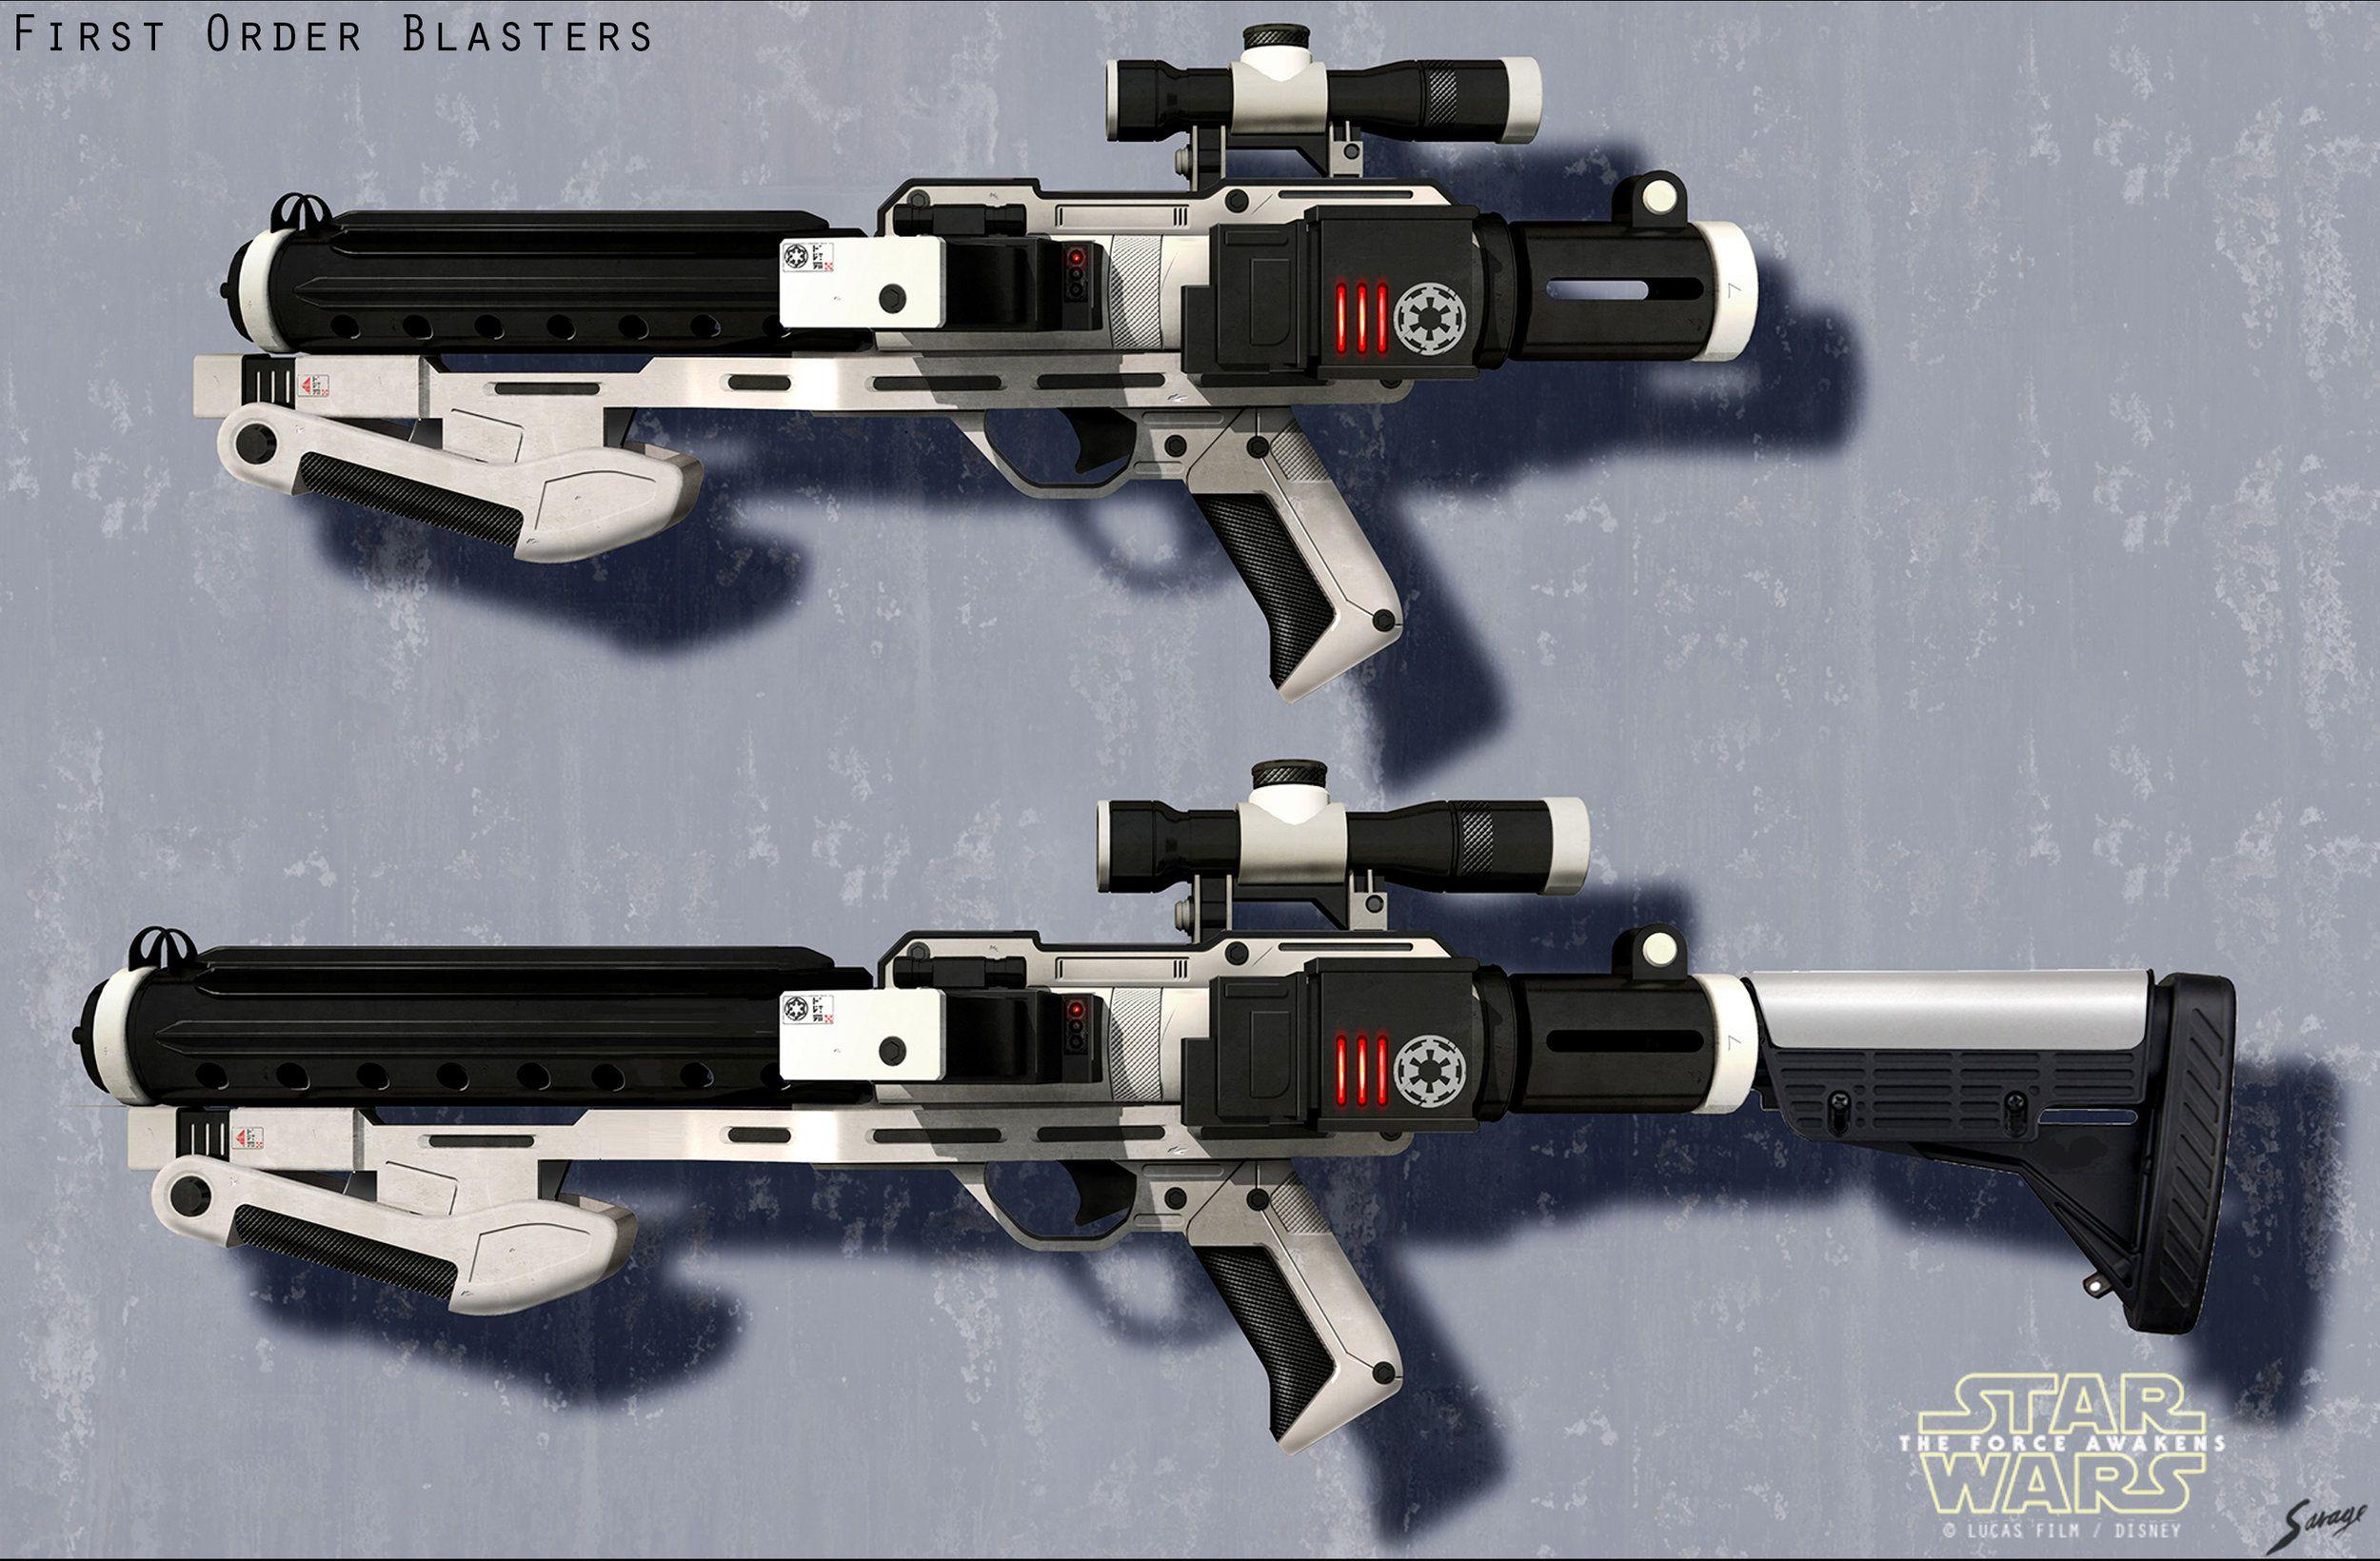 Star Wars Custom V2 Clone Commando Captain Fordos BlasTech DC-17 Extended Side Arm Blaster Pistol Prop